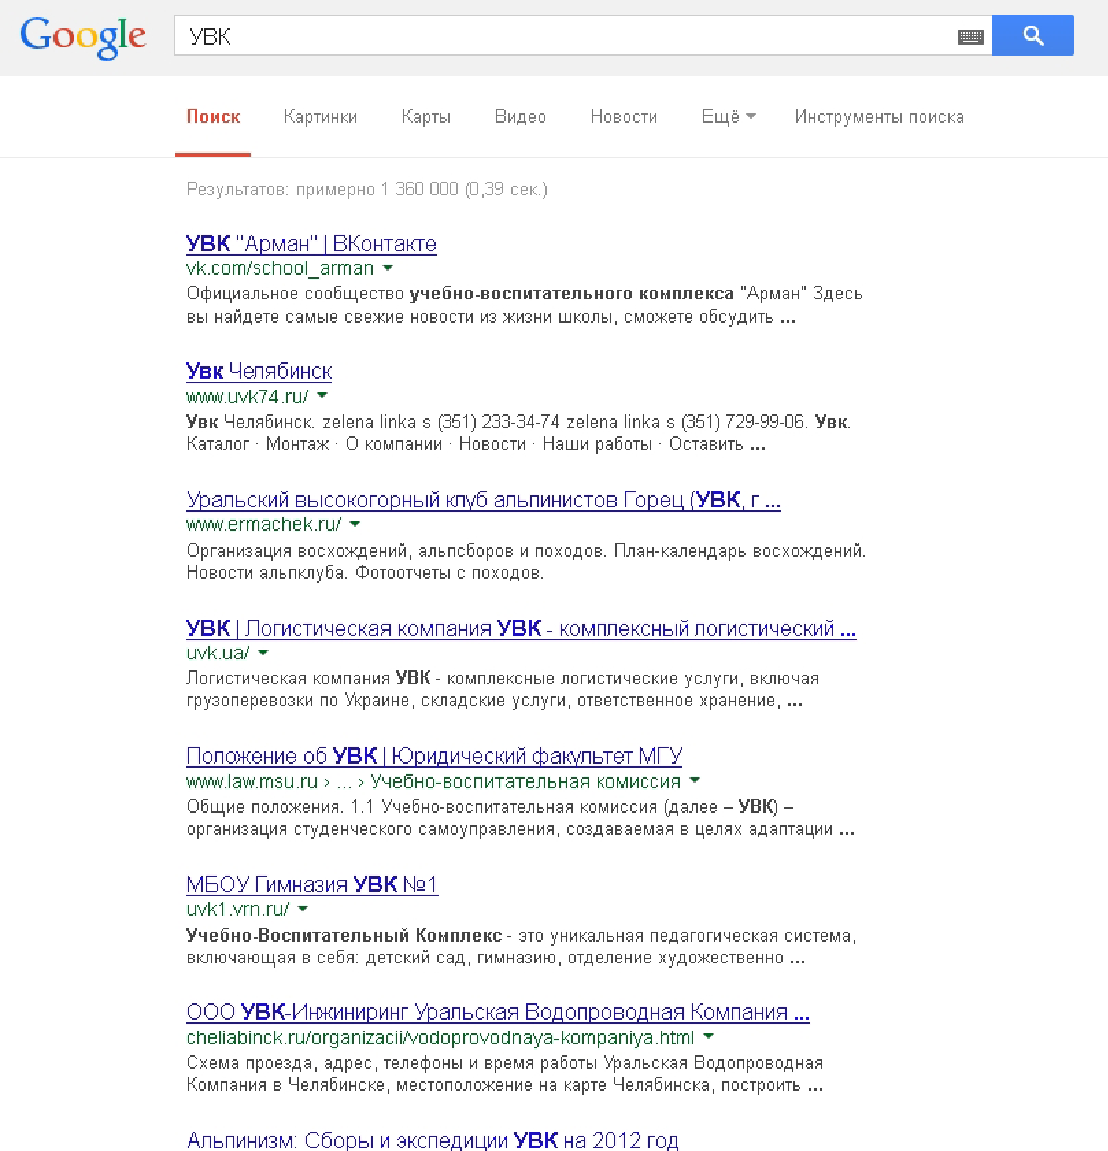 uvk-google-001-001